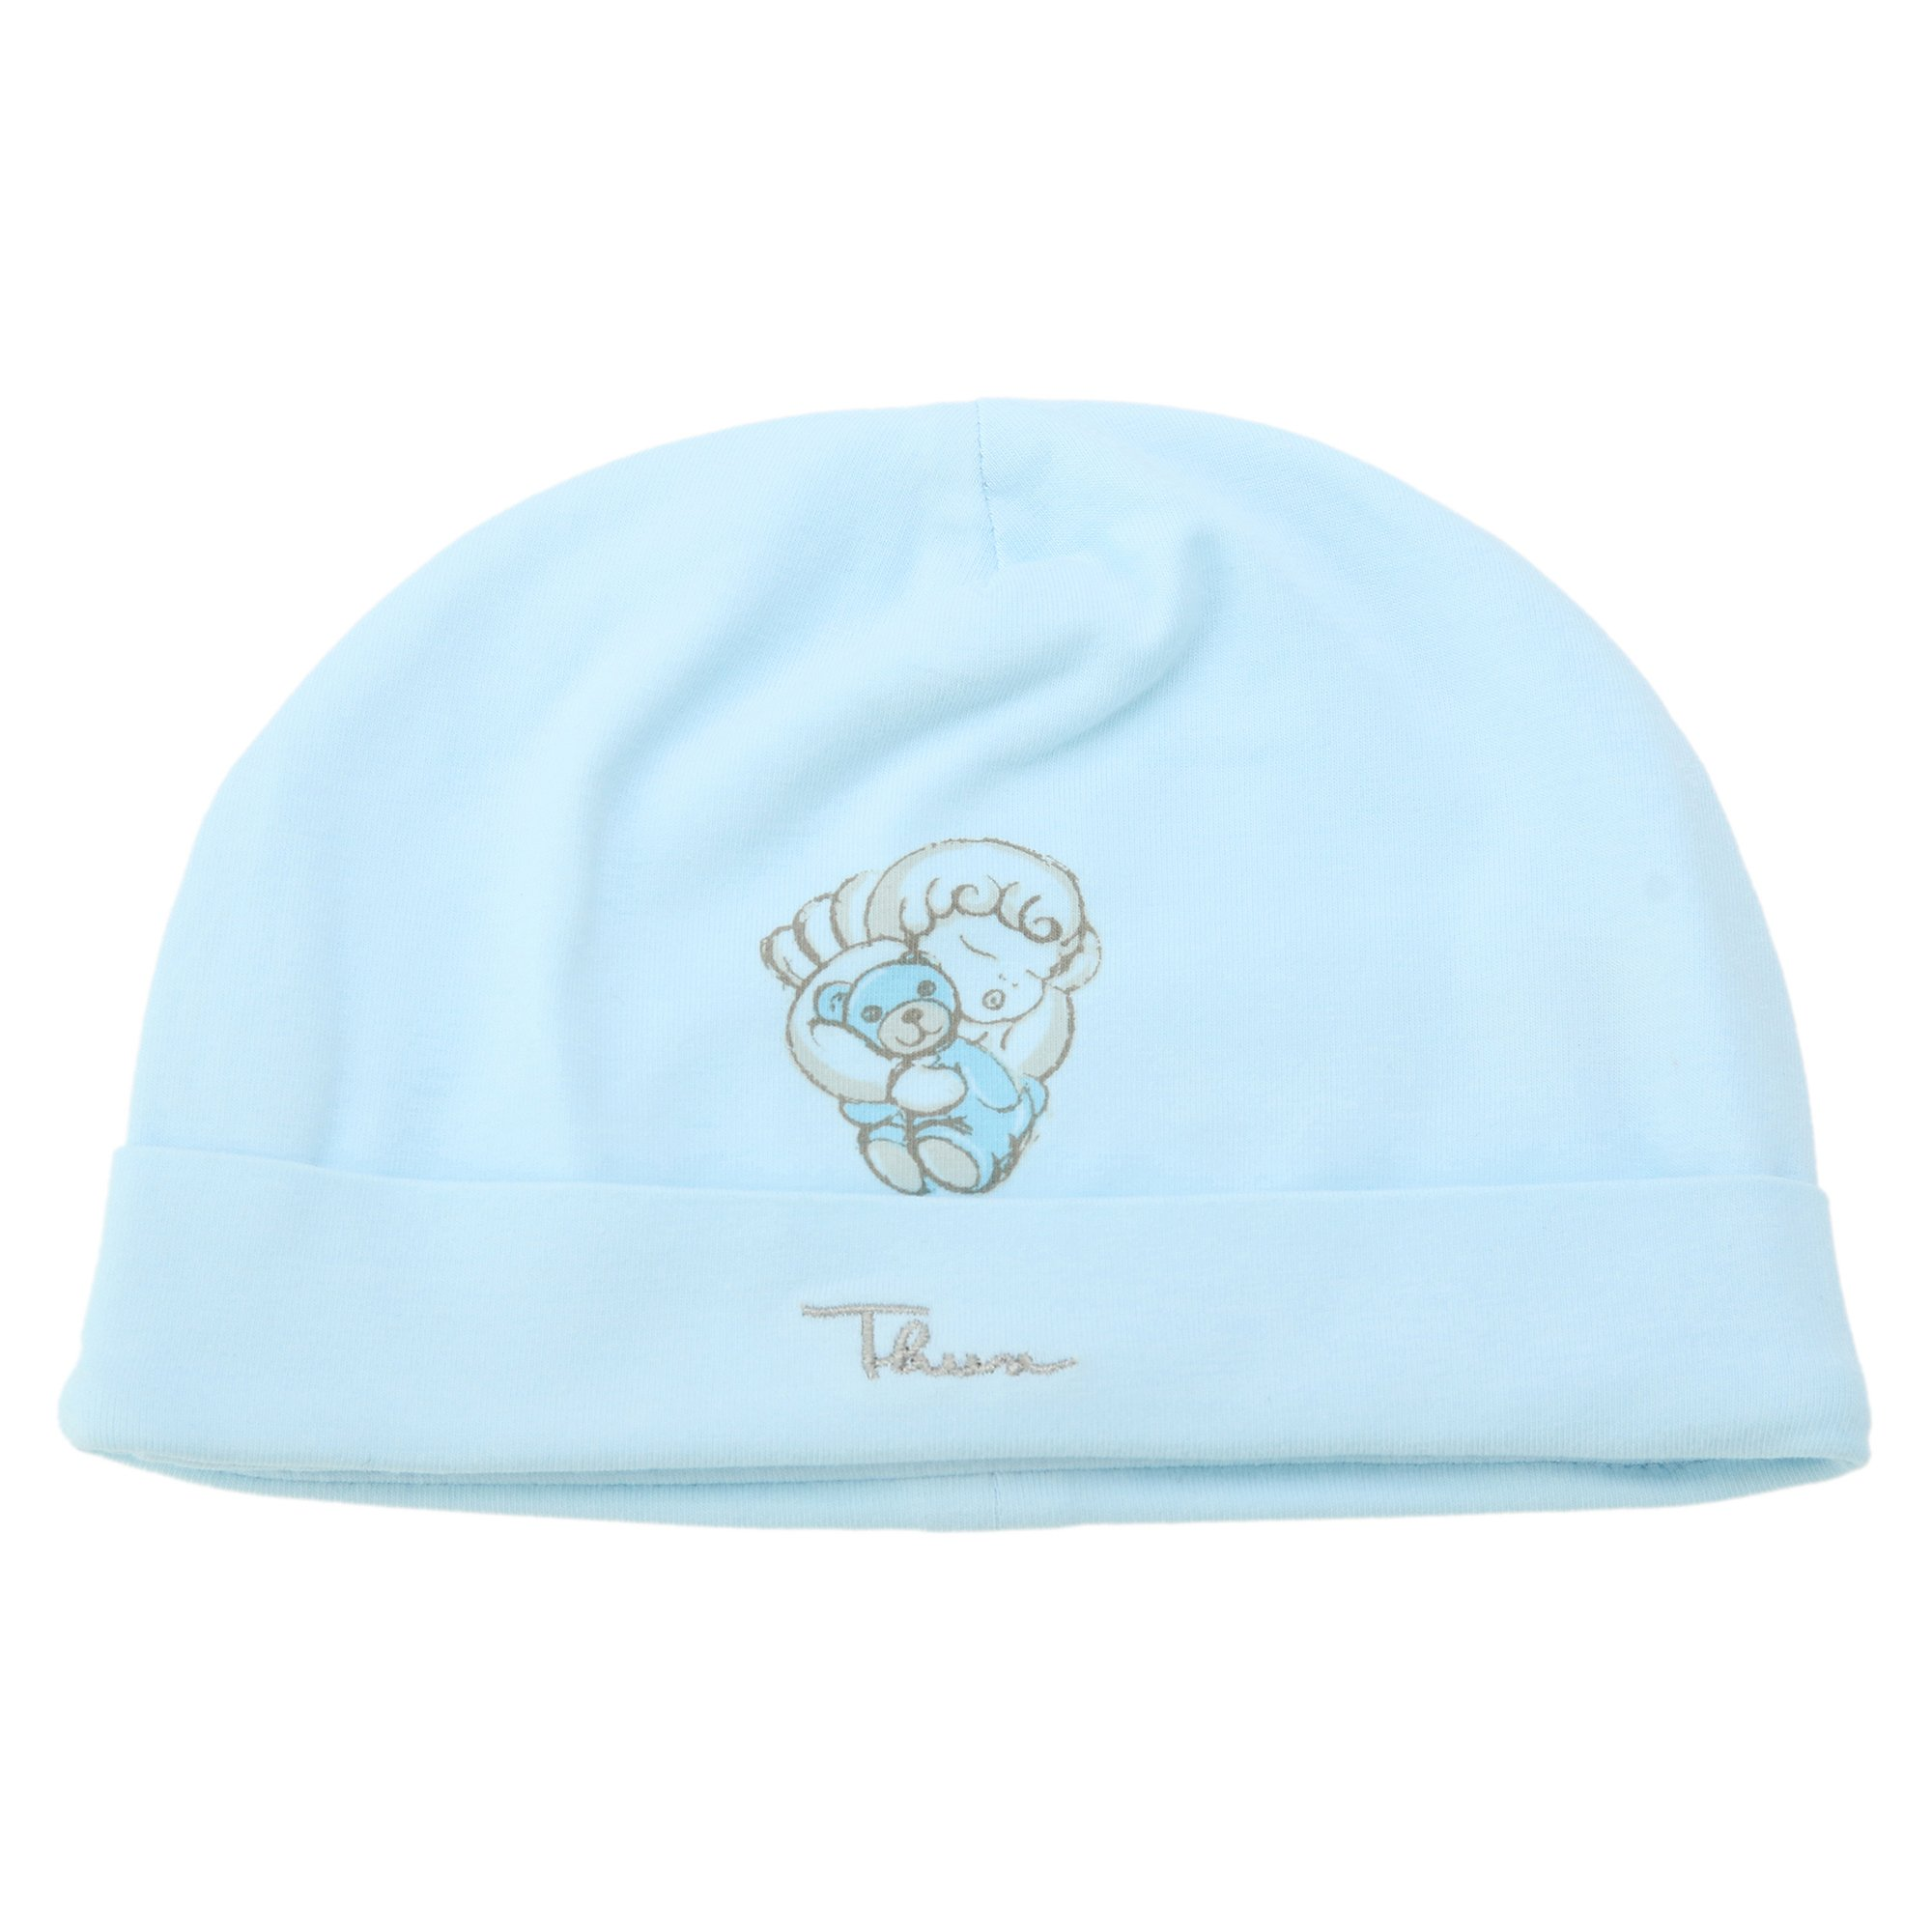 Thun Angel Berretto, 95% Cotone, 5% Elastan, Blu Soft, 6 mesi-62 cm